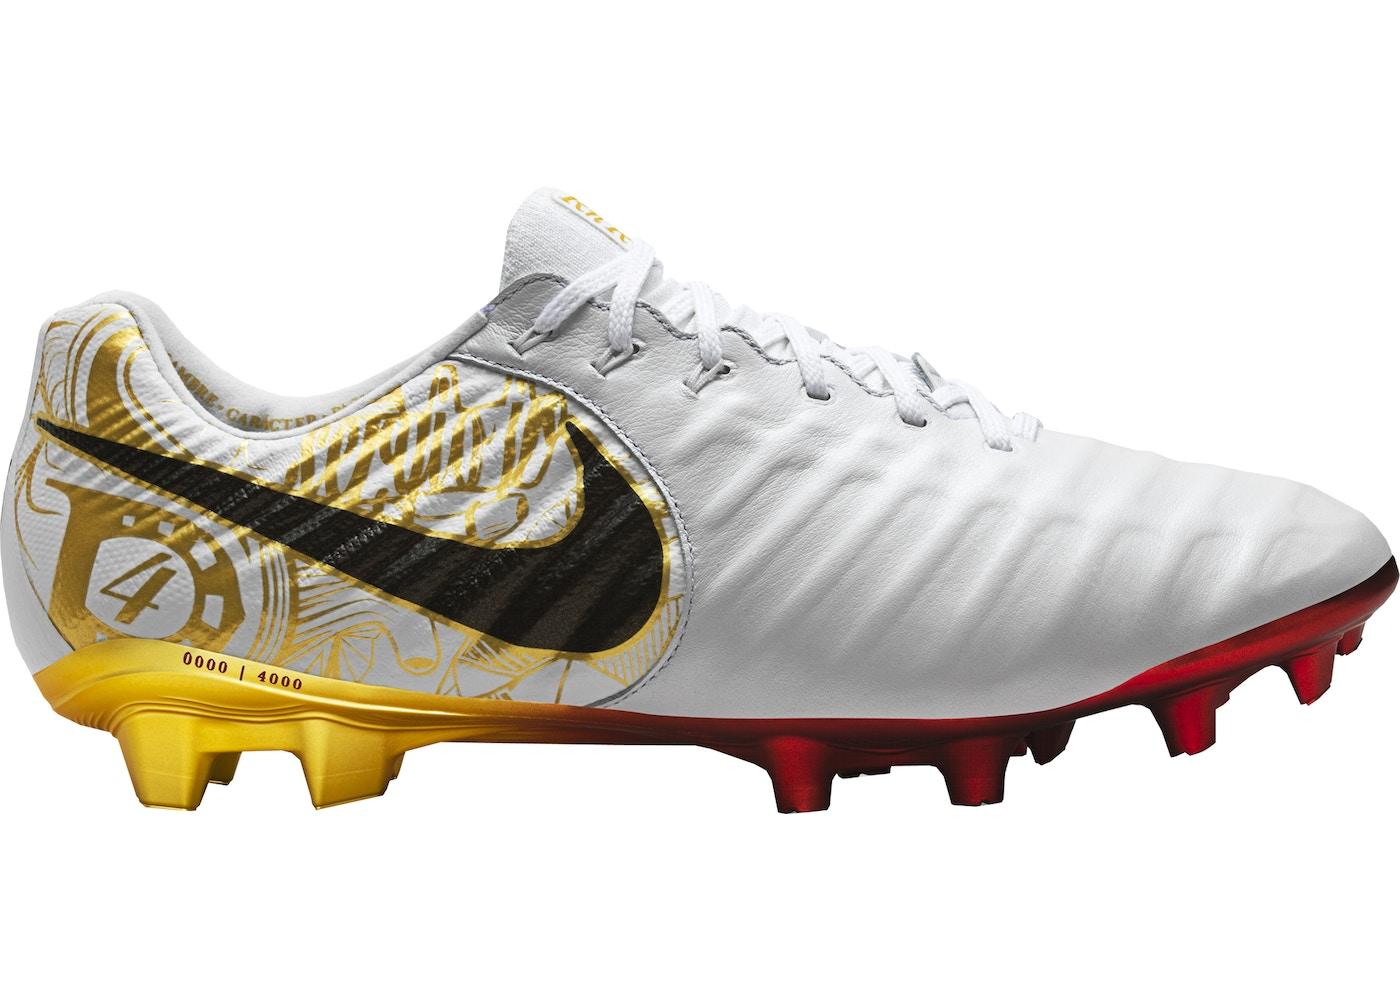 lowest price f1d87 bcf04 Nike Tiempo Legend VII Sergio Ramos Corazon Y Sangre